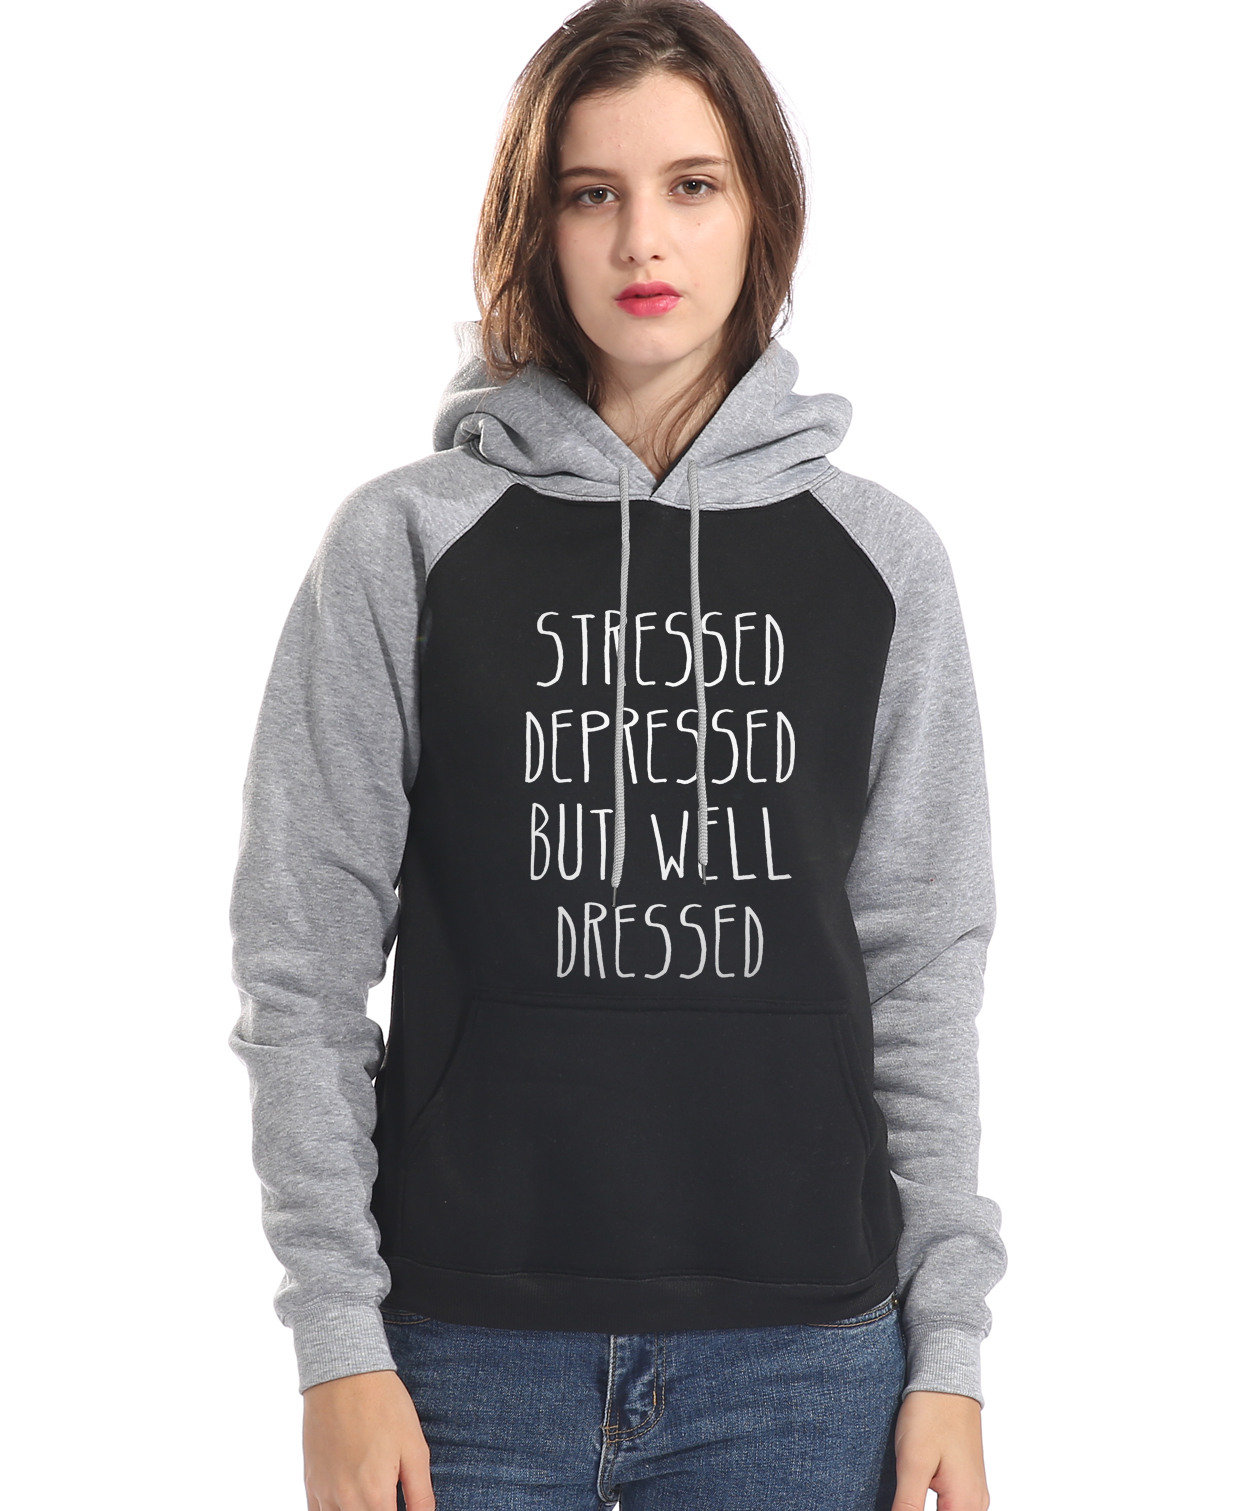 hooded 2017 raglan sleeve fitness sweatshirt STRESSED DEPRESSED BUT WELL DRESSED women kpop harajuku tracksuit femme brand hoody